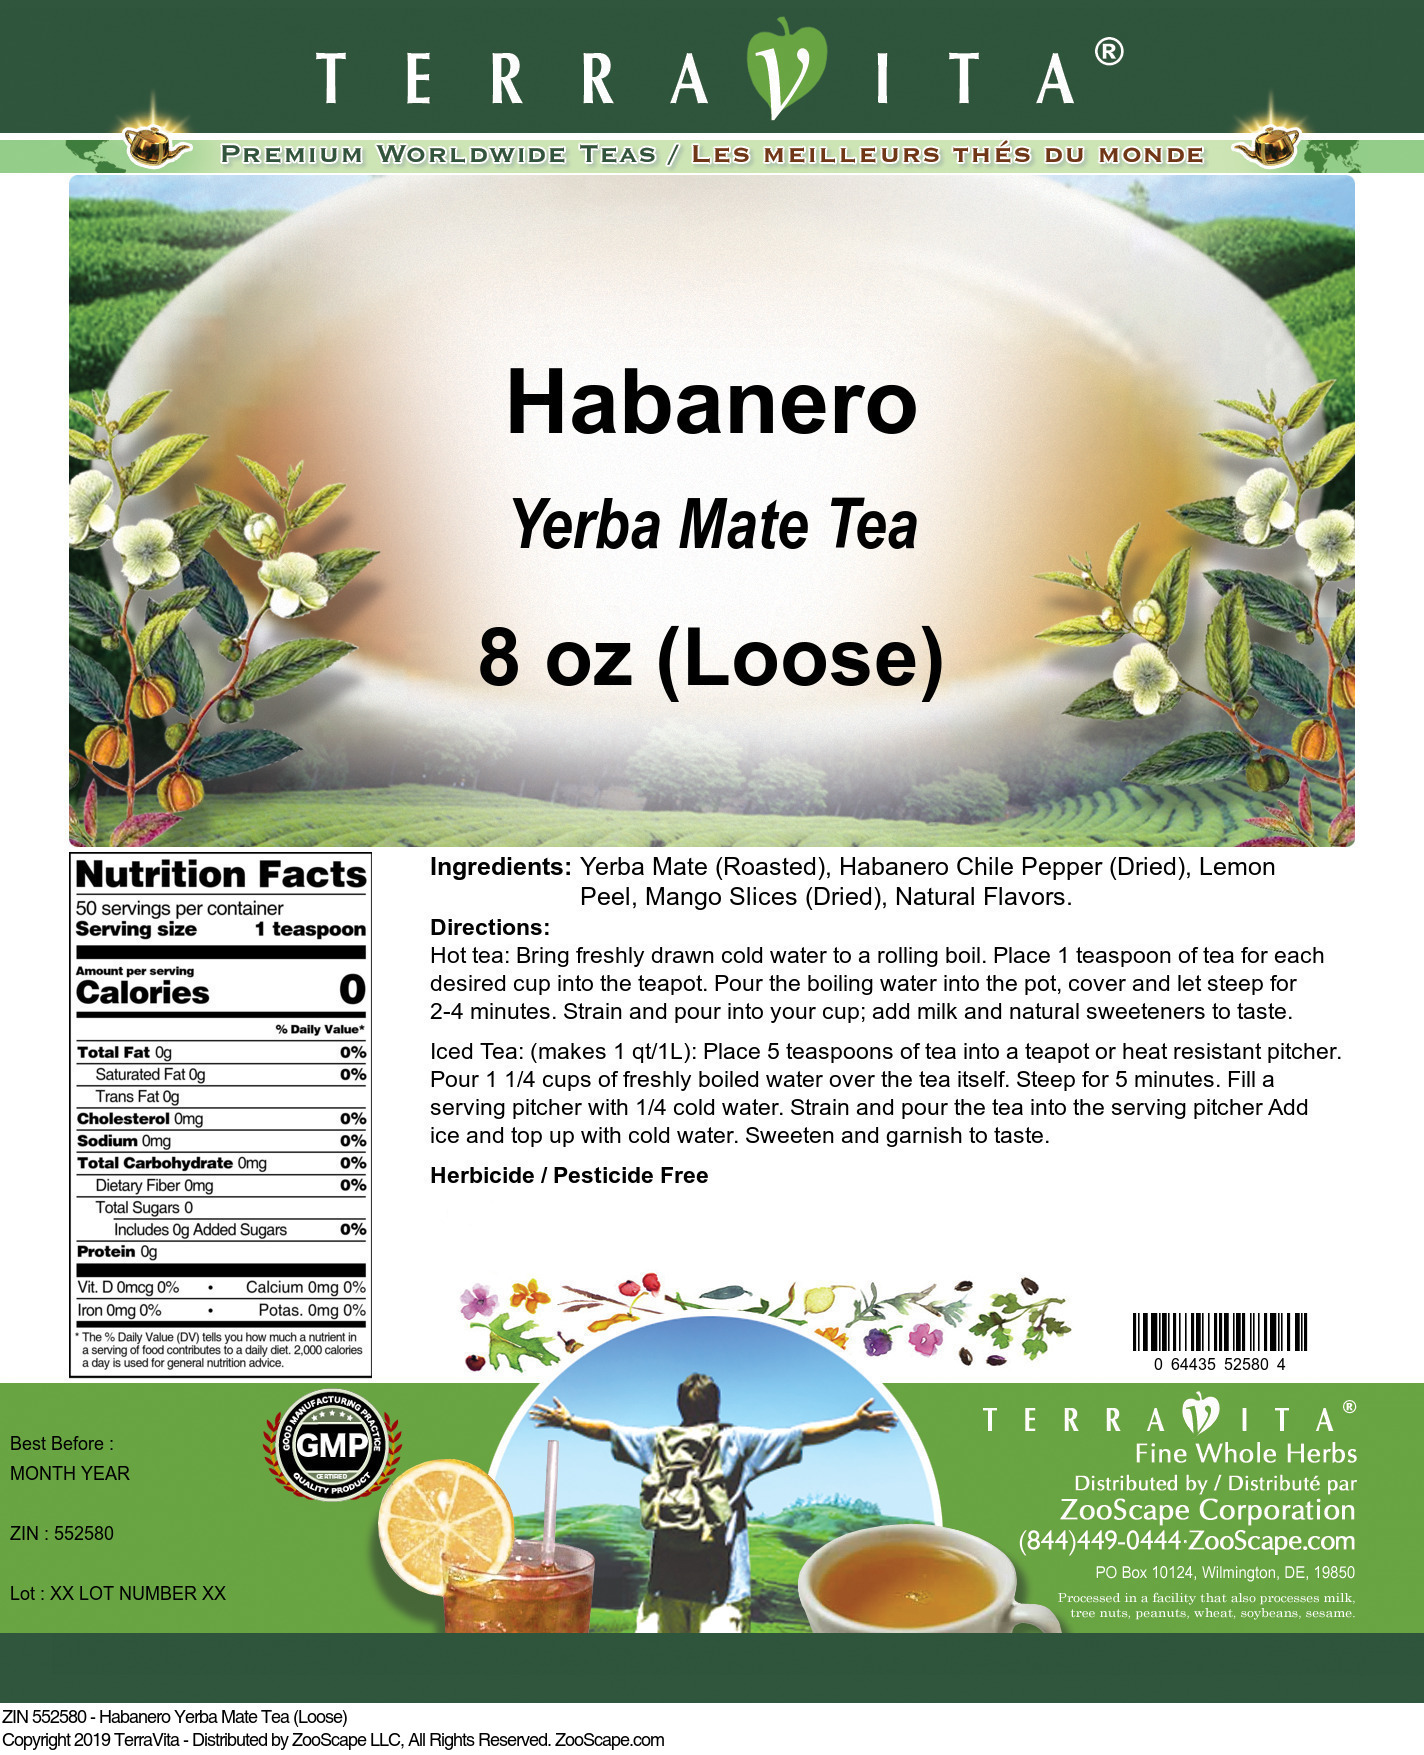 Habanero Yerba Mate Tea (Loose)